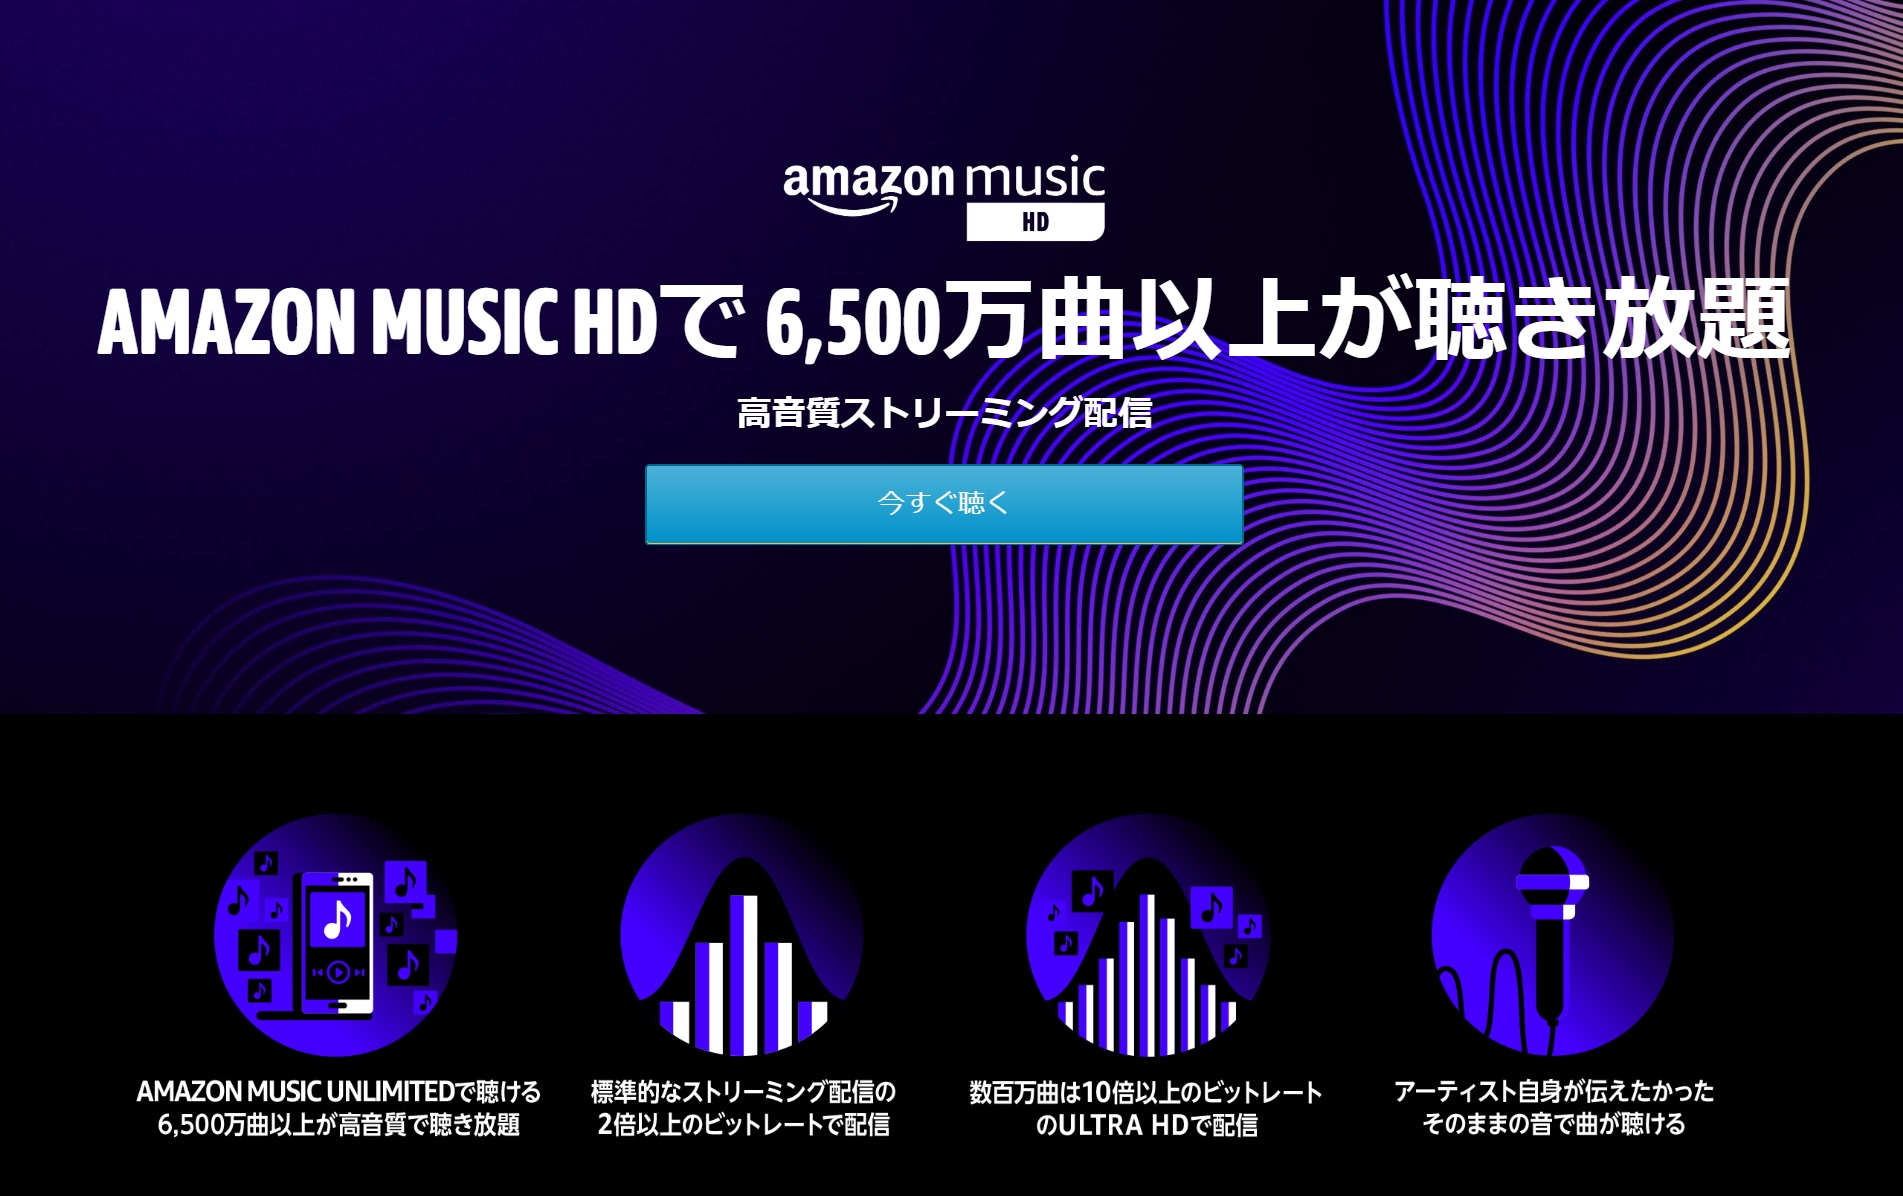 Amazon Music HD 感想